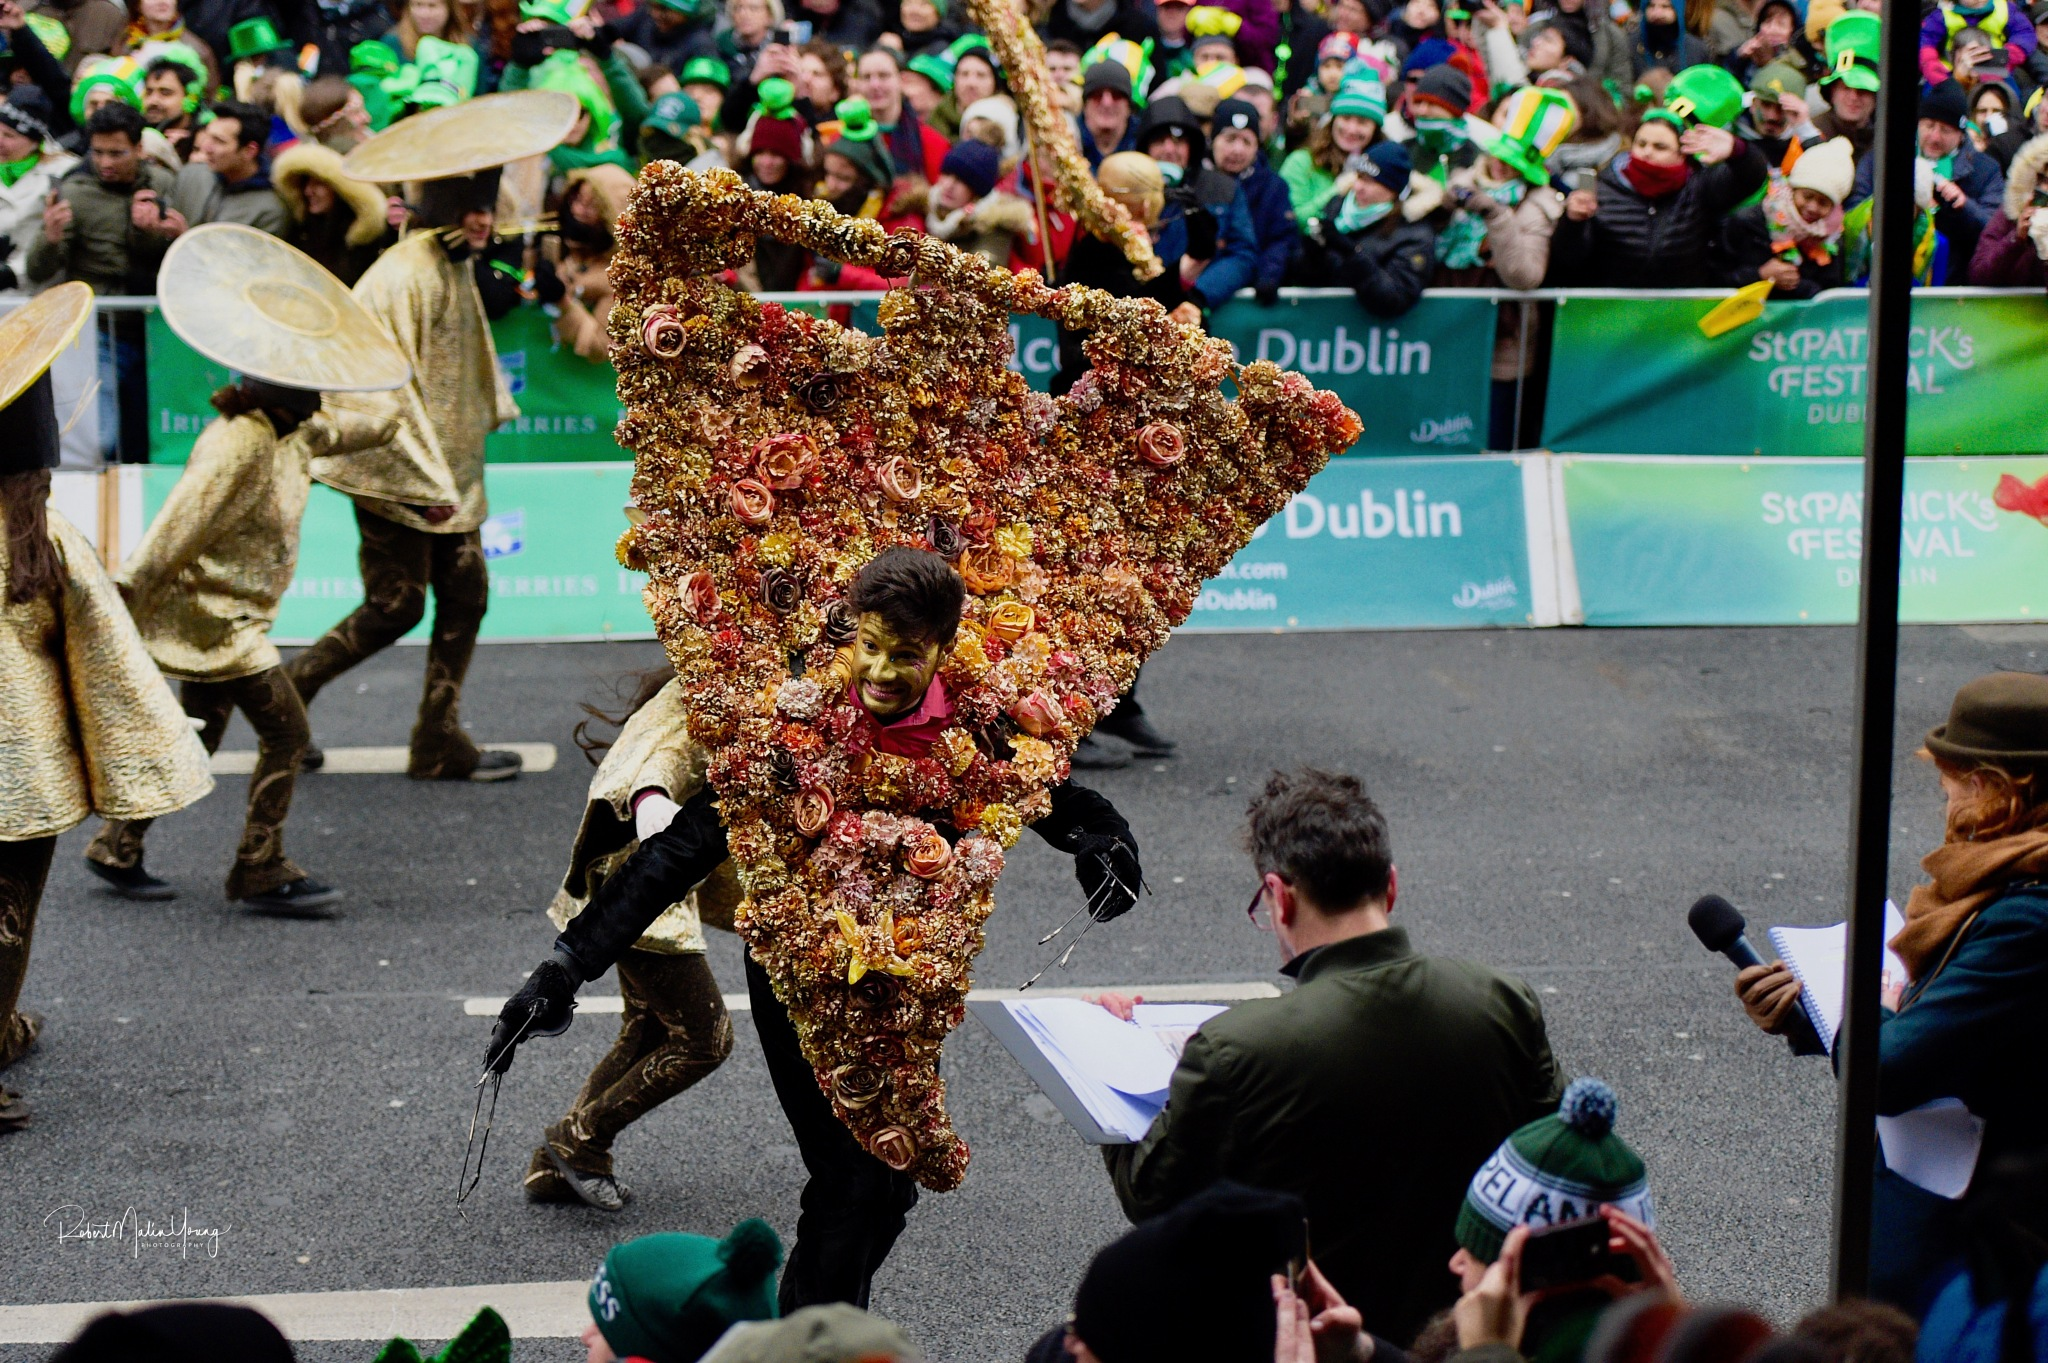 Dublin - Saint paddy's Day - 2017 by Robert Malin Young